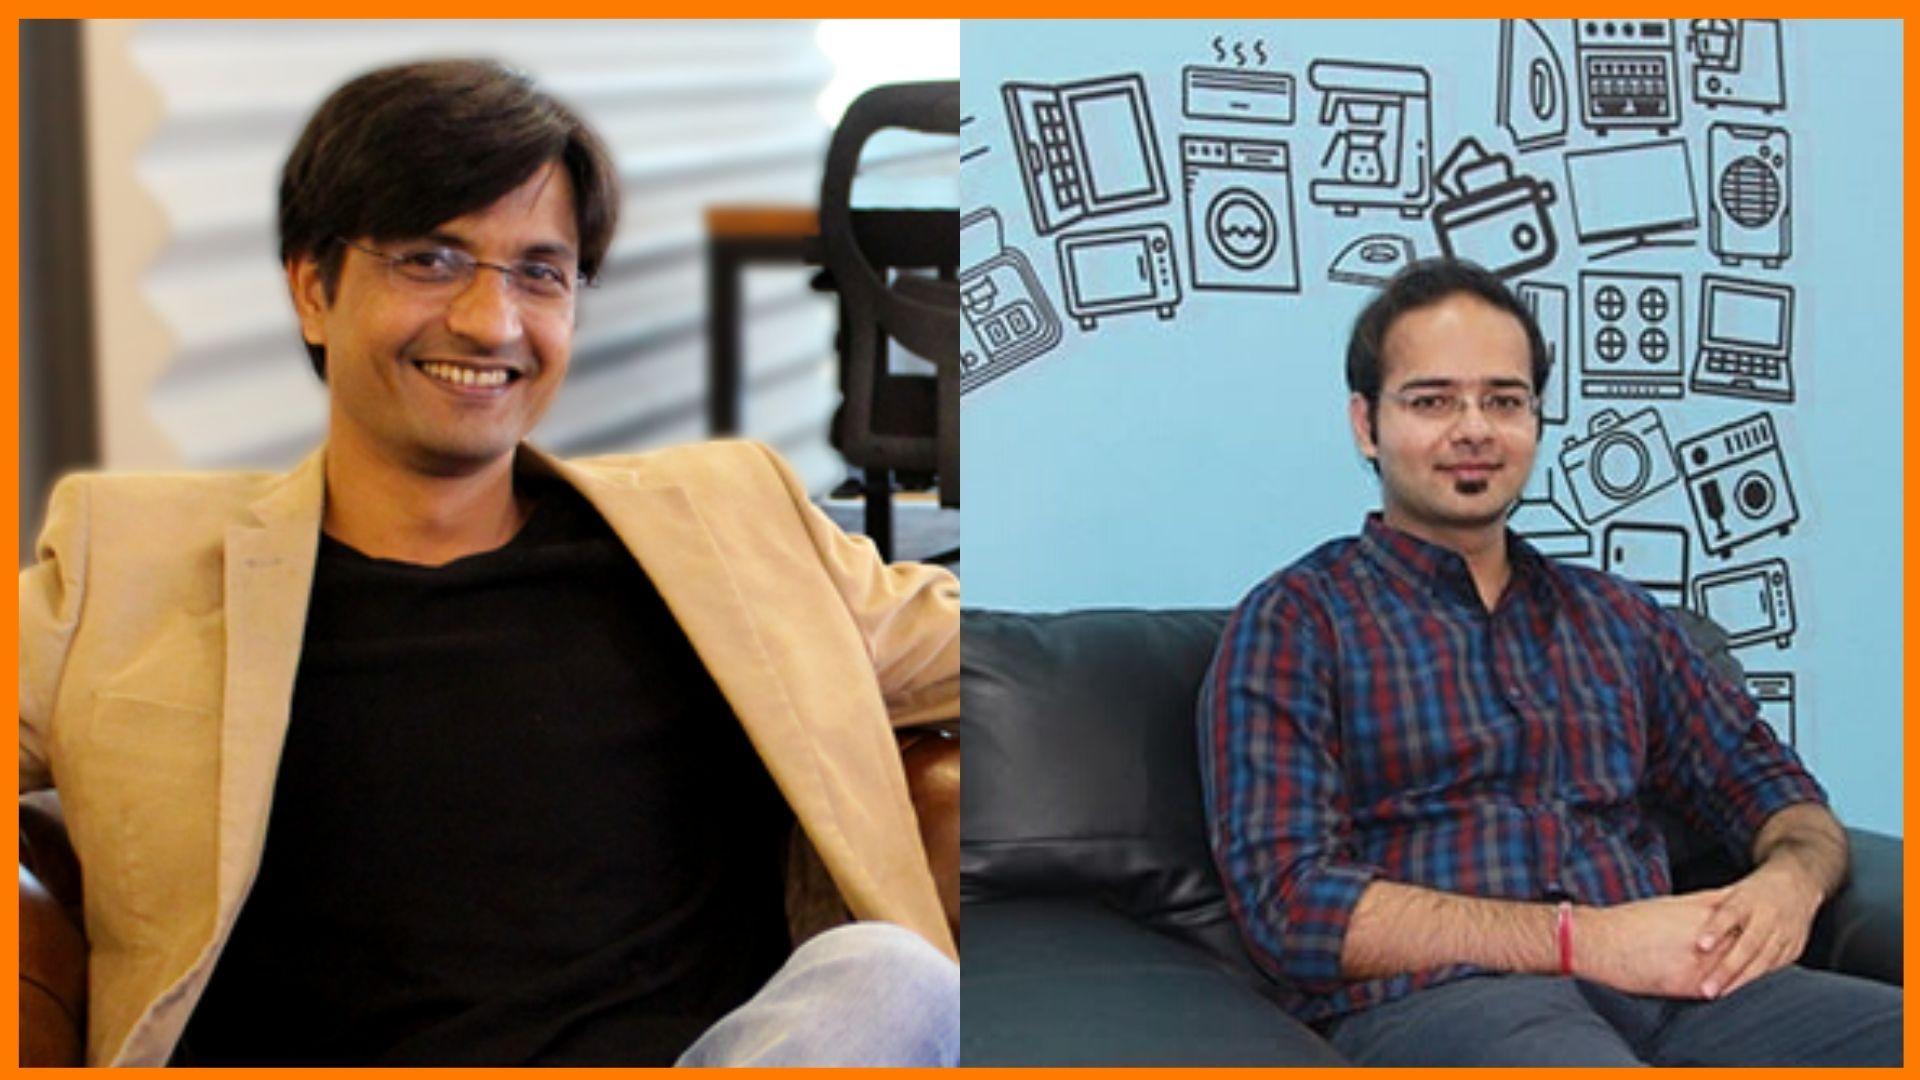 Khushnud Khan and Rishi Raj Rathore are Founders of Arzooo